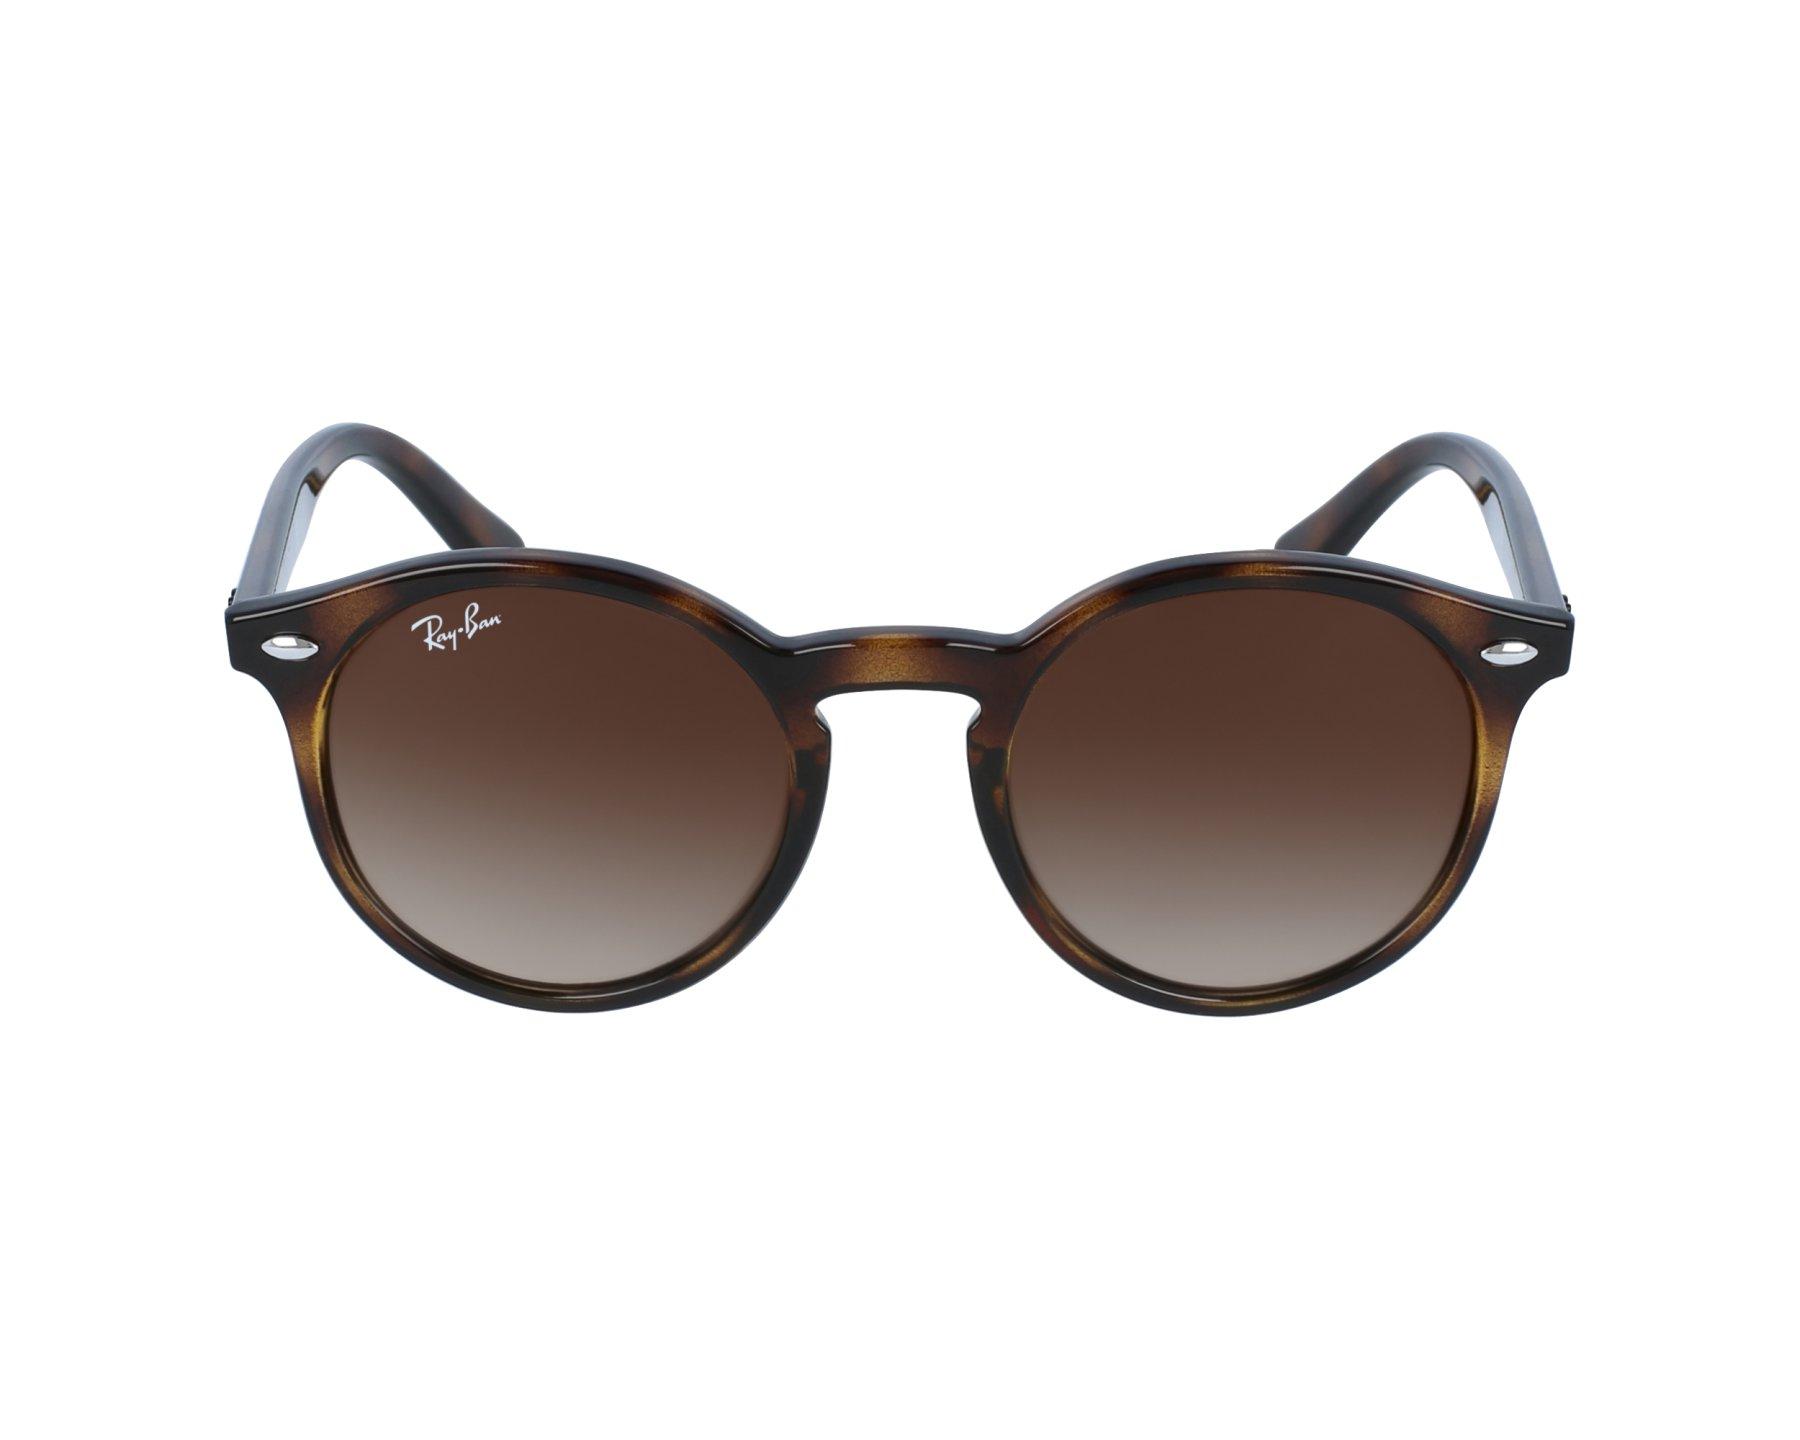 8ccb1e74c72b02 Sunglasses Ray-Ban RJ-9064-S 152 13 - Havana profile view